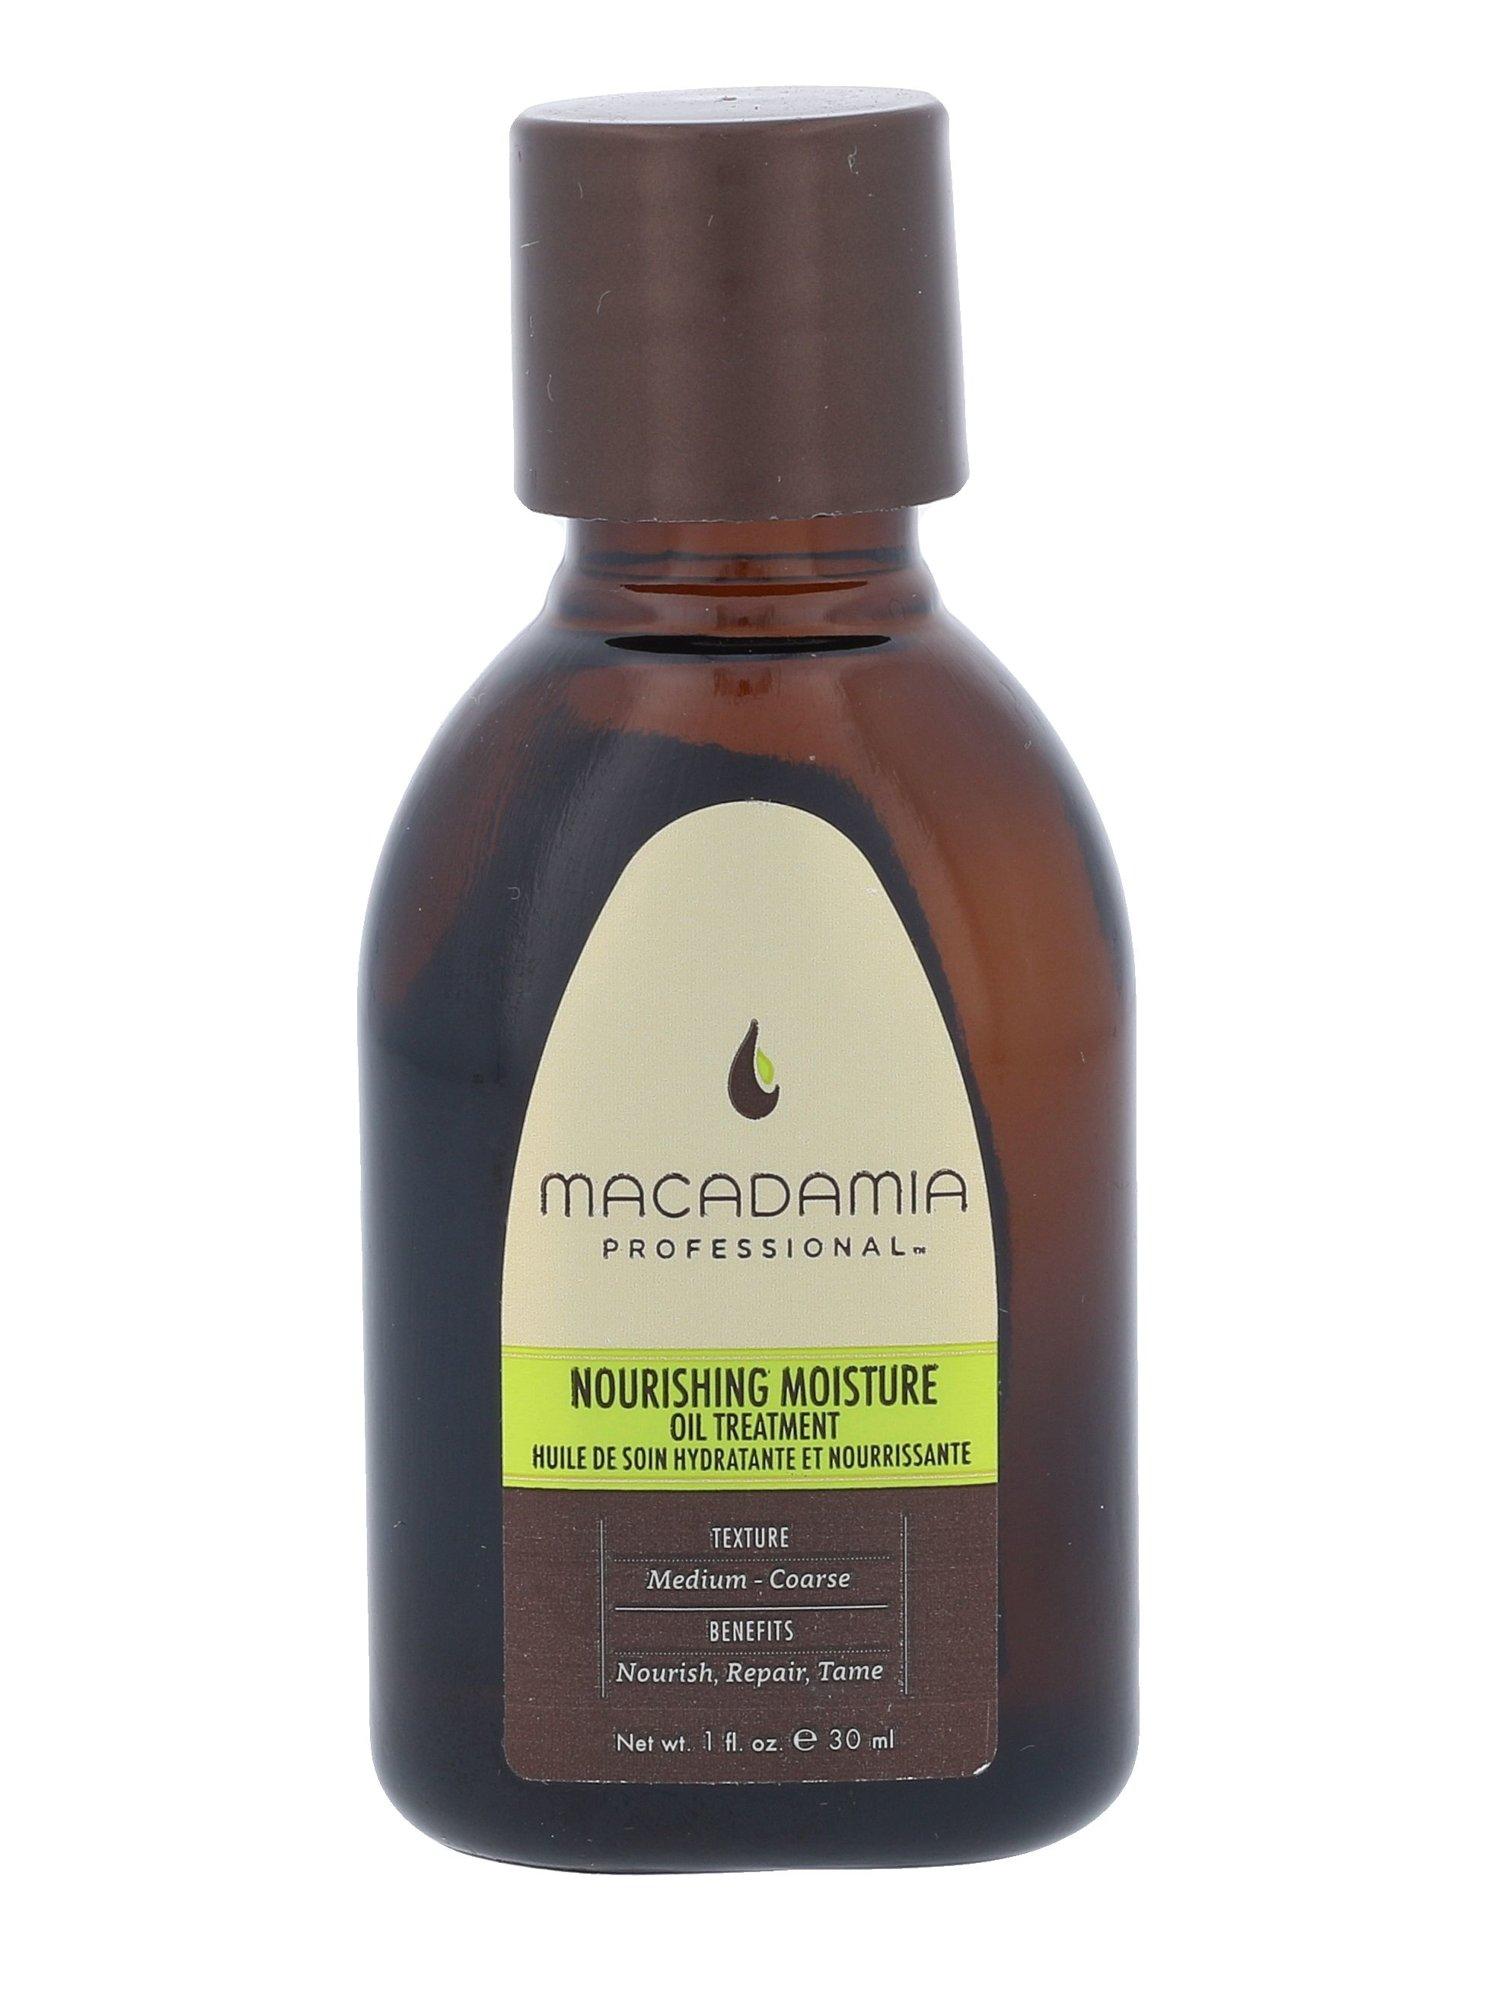 Macadamia Professional Nourishing Moisture Cosmetic 30ml